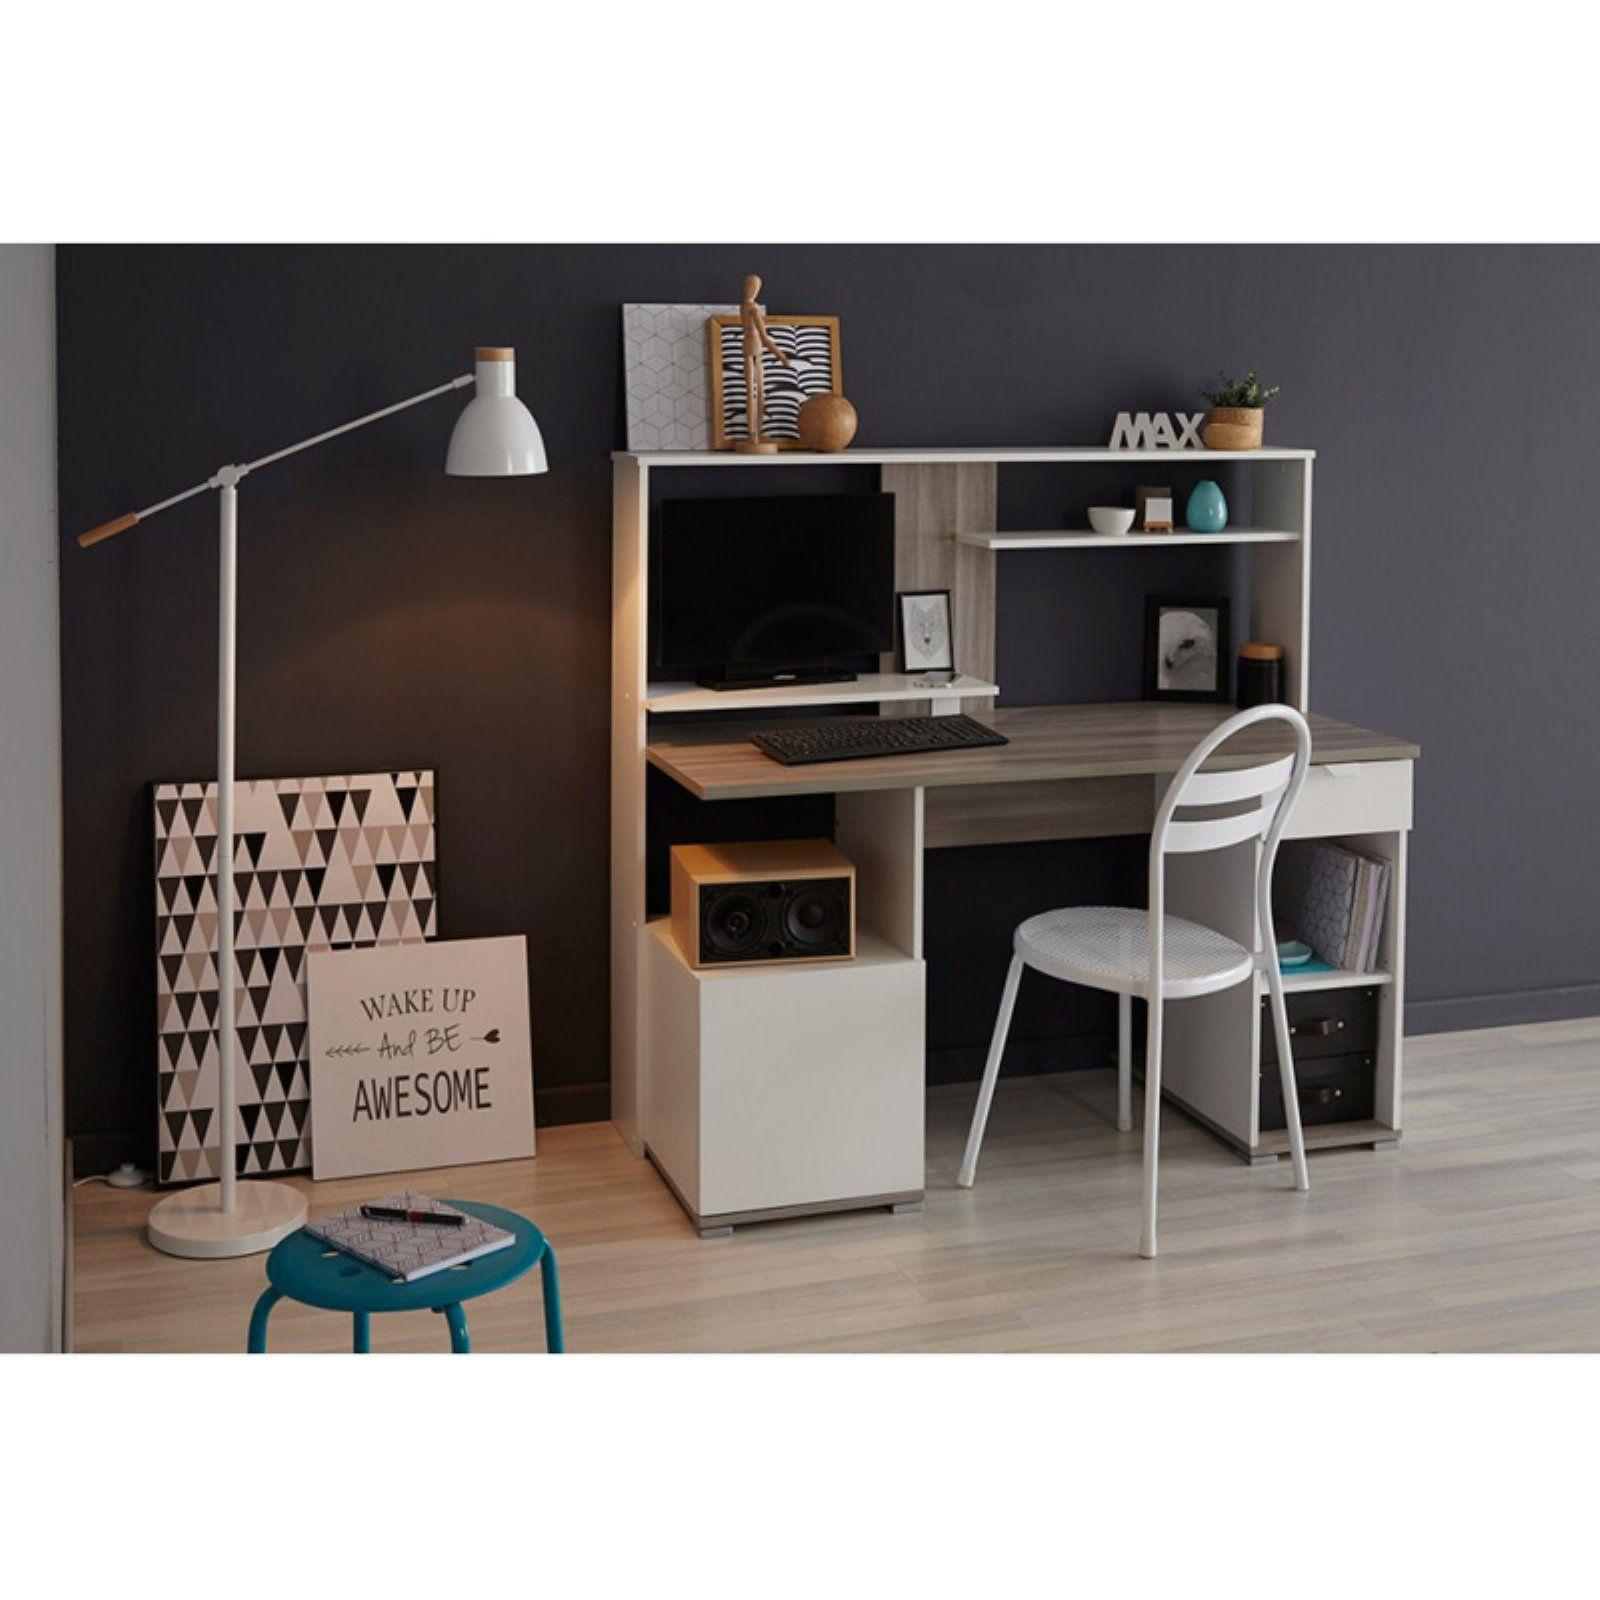 Parisot Twitt Desk Desk Stylish Desk Desk Storage